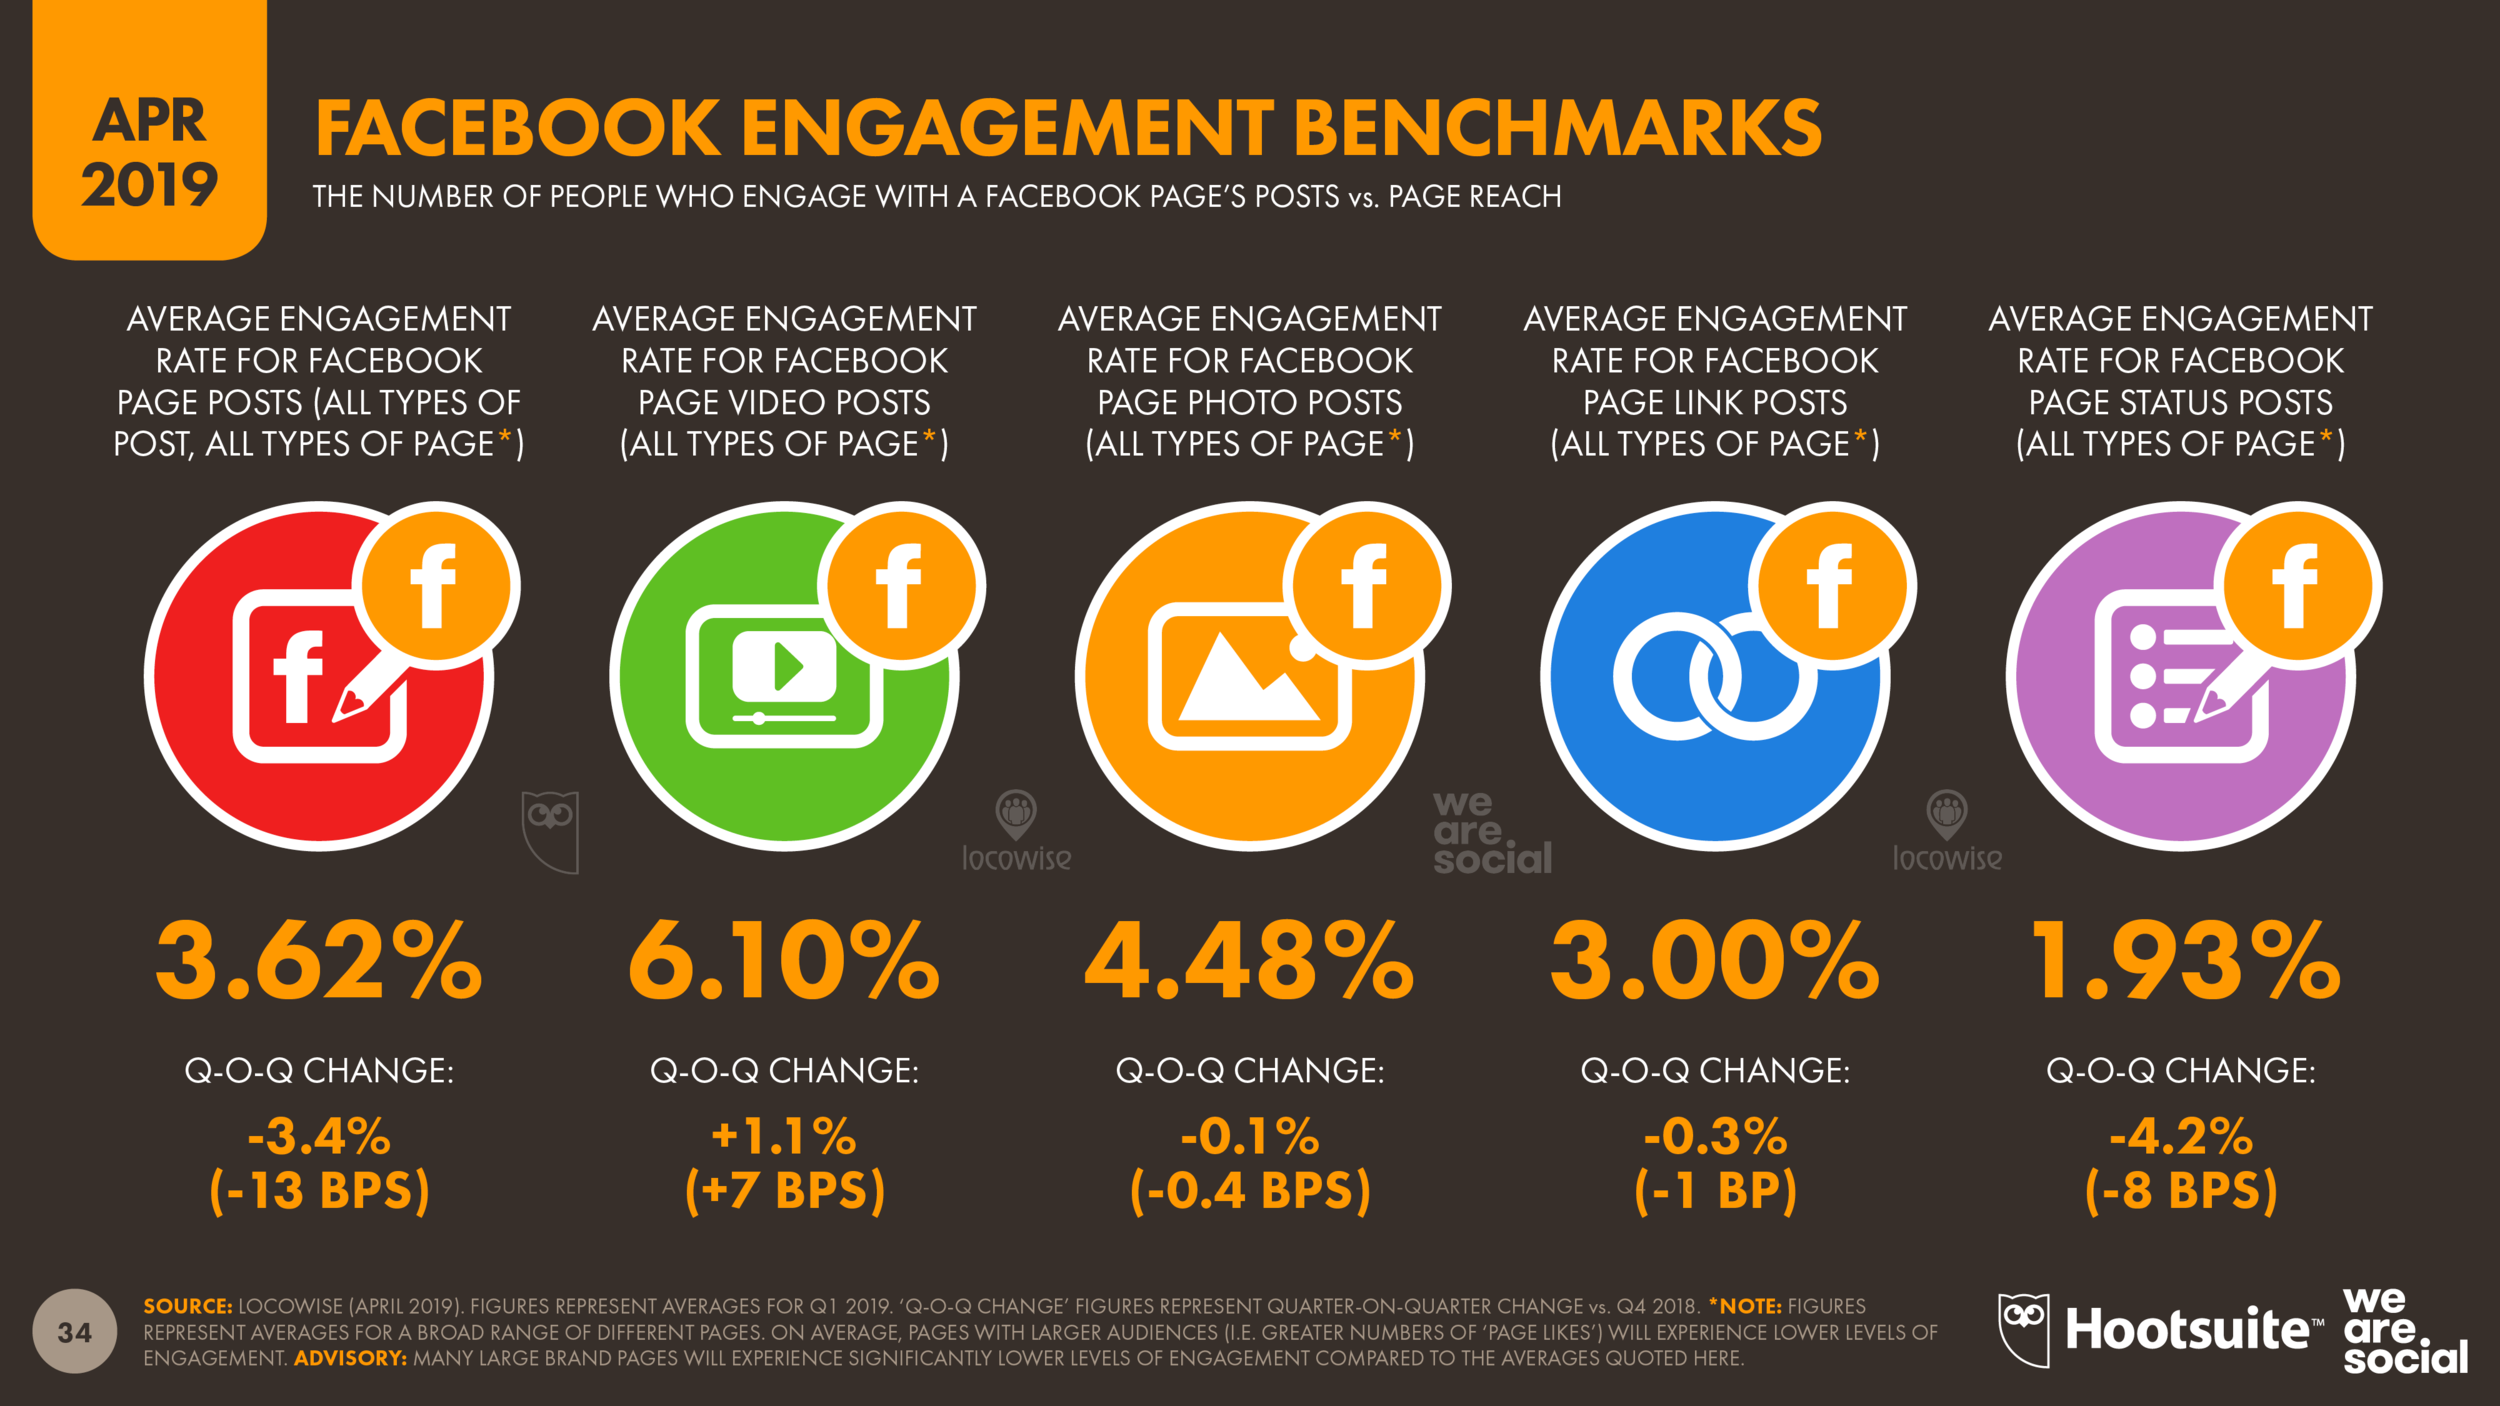 Facebook Engagement Benchmarks April 2019 DataReportal